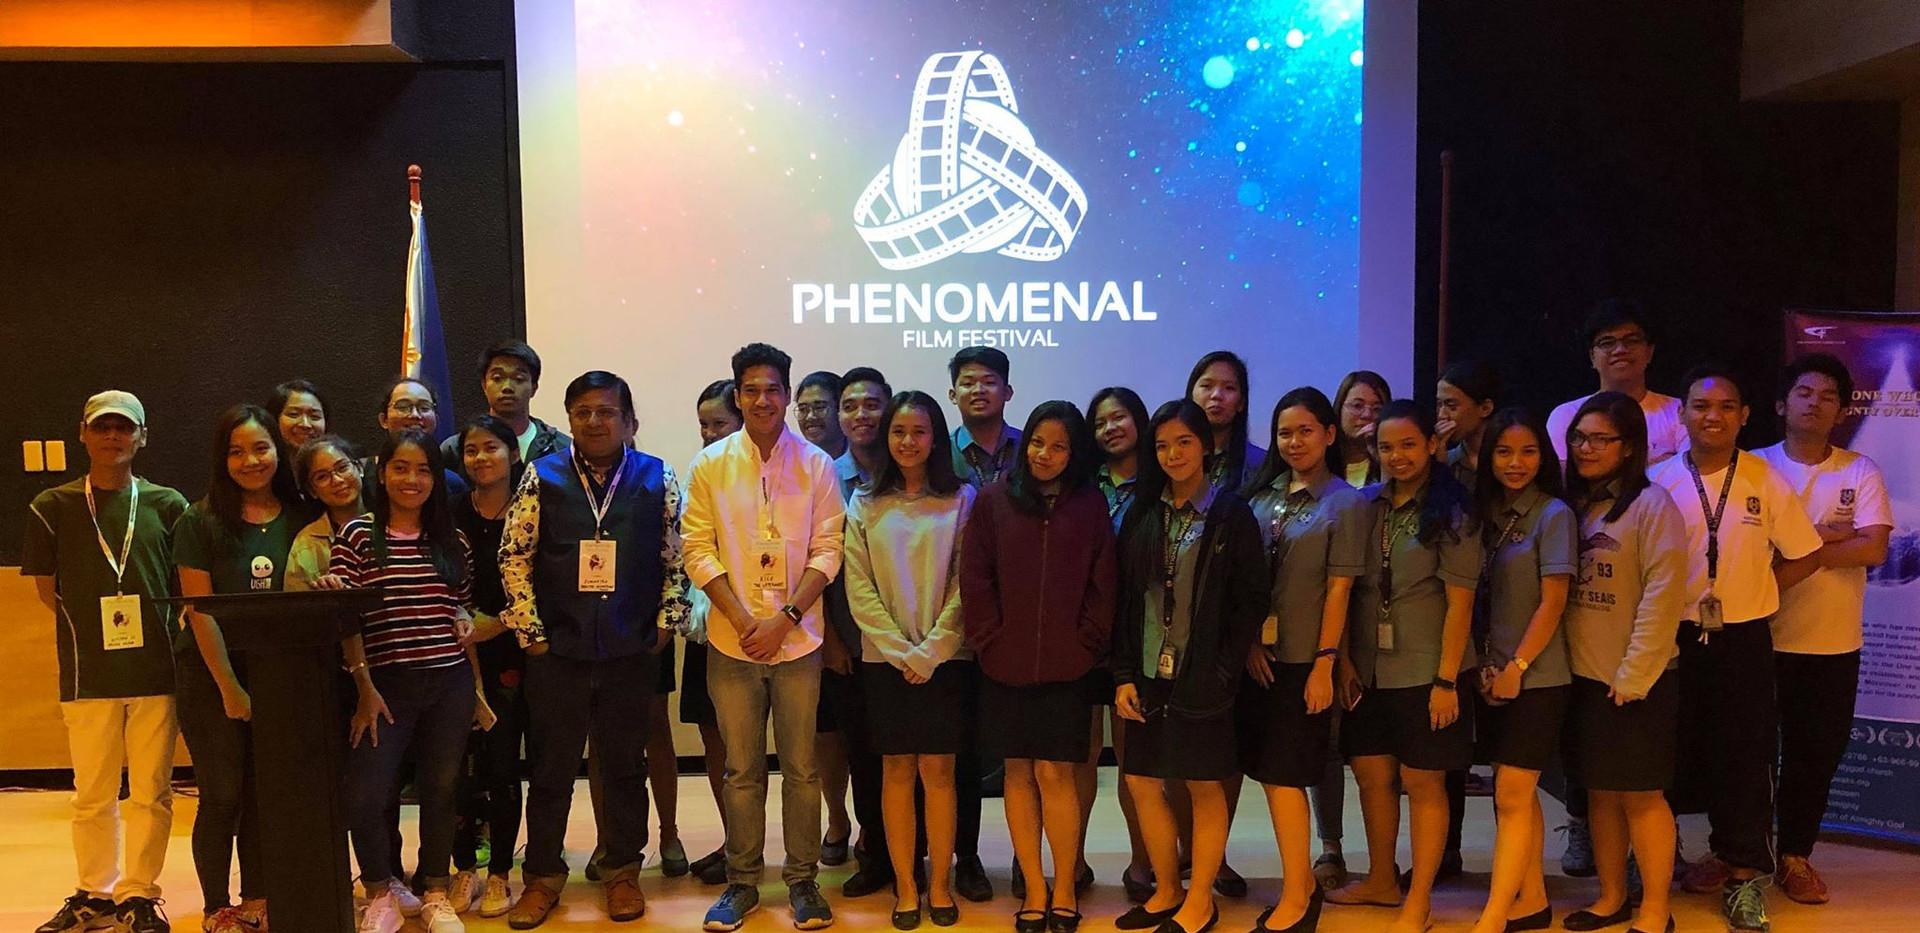 Phenomenal Film Festival, Manila